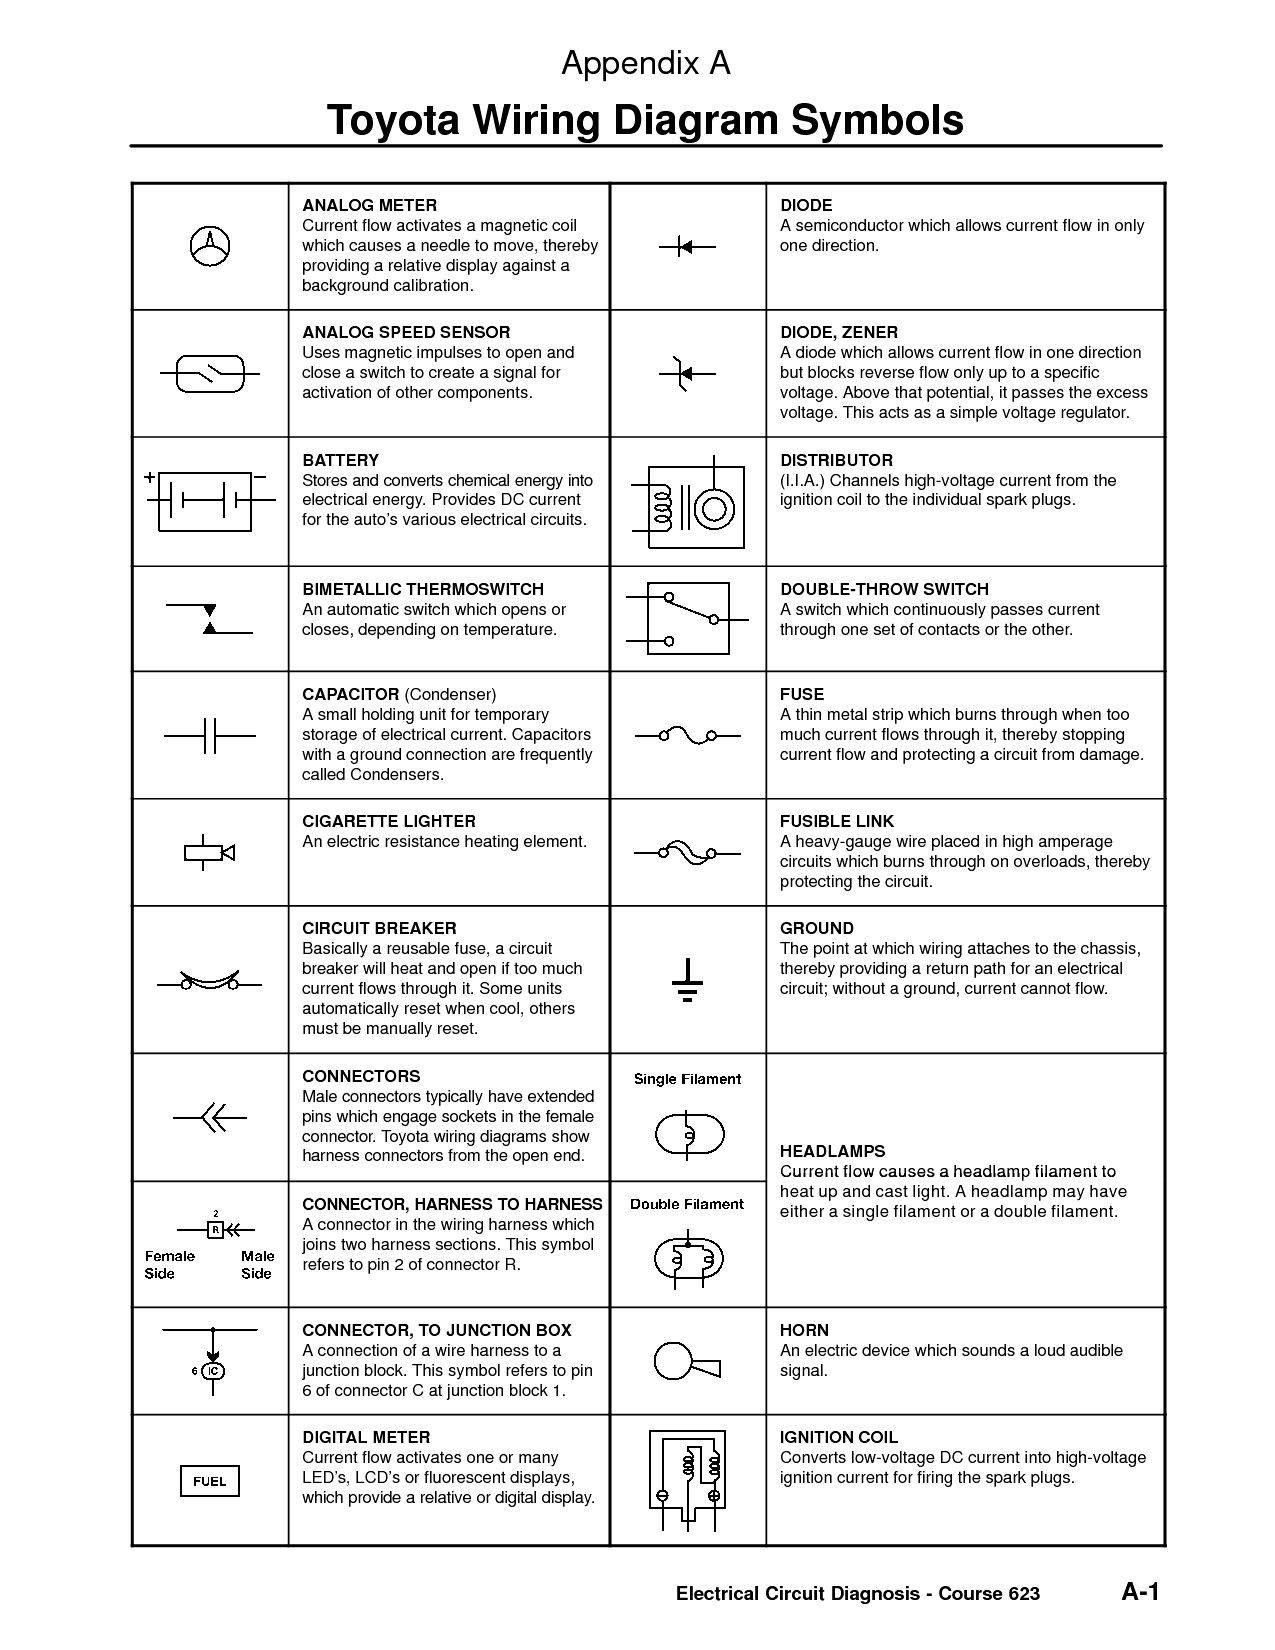 [SCHEMATICS_4LK]  MZ_0463] Electric Circuit Symbols All Schematic Symbols Chart Circuit Symbols  Schematic Wiring   Wiring Diagram Schematic Symbols      Pala Pelap Inifo Hendil Mohammedshrine Librar Wiring 101